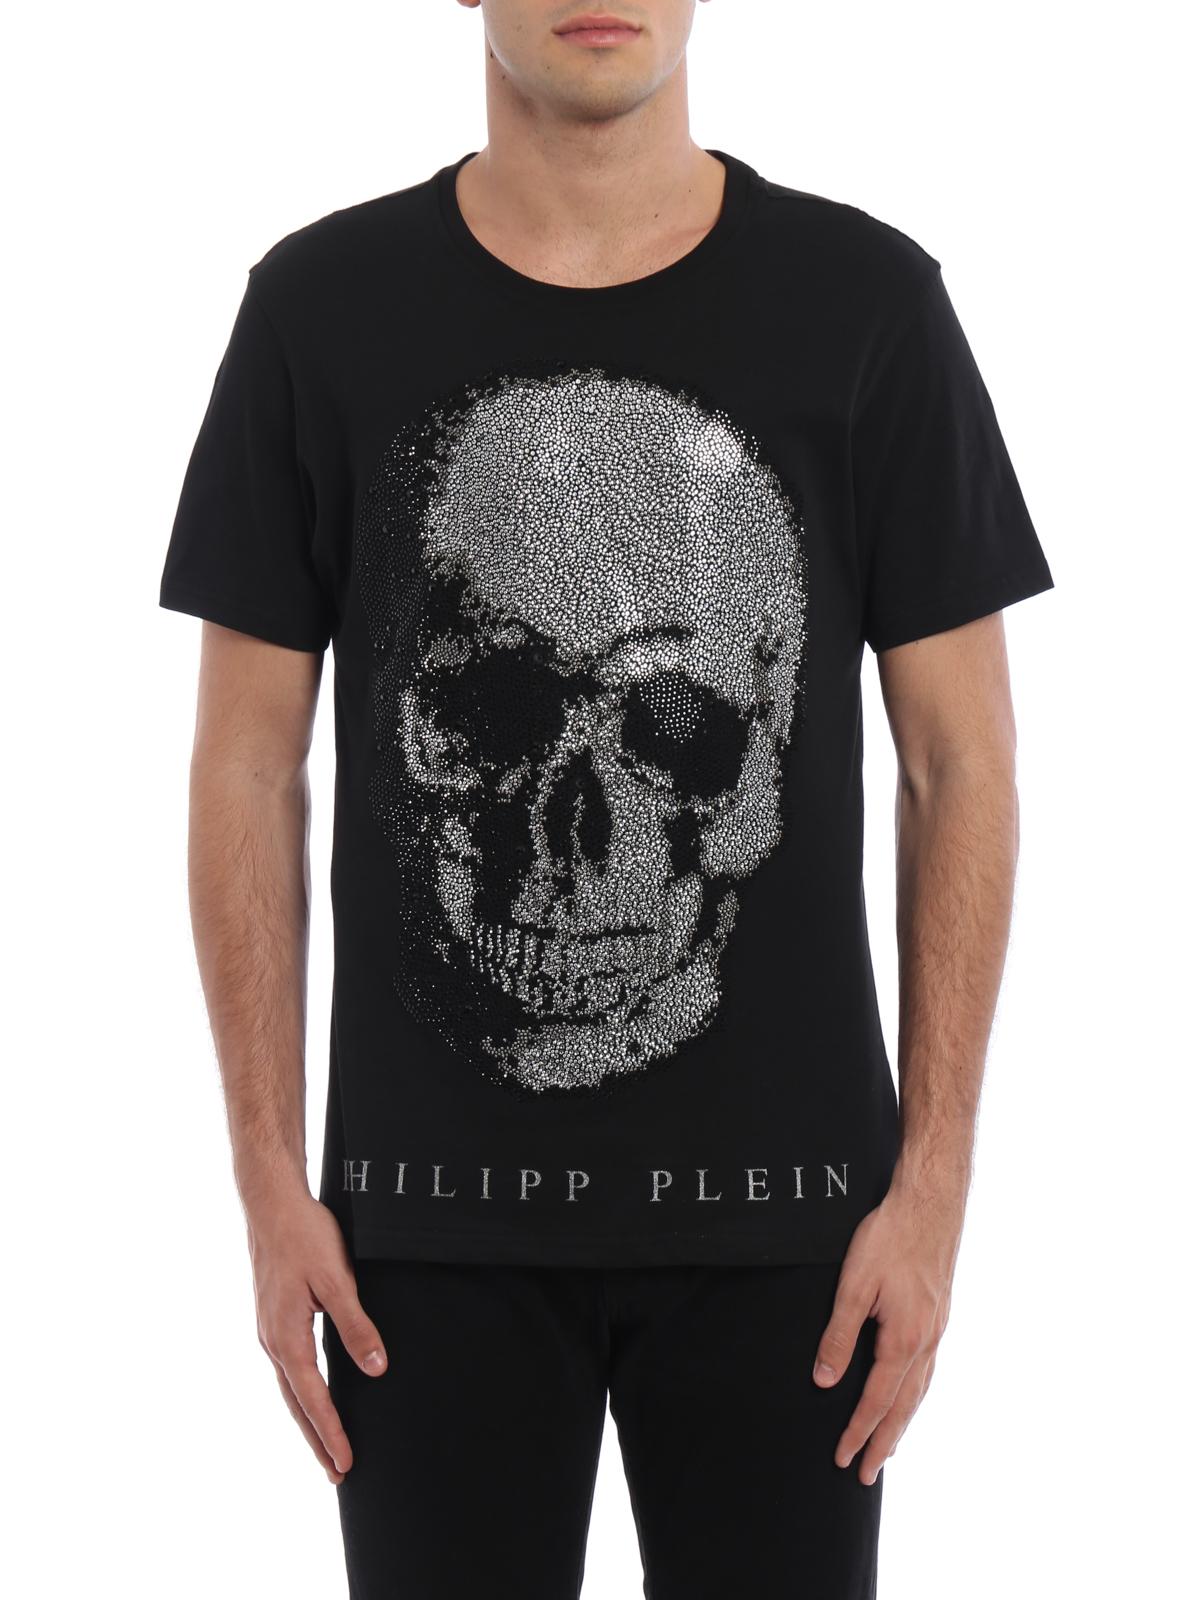 Free Shipping Pre Order Discount Fast Delivery embellished Skull T-shirt - Black Philipp Plein Genuine Cheap Sale Best Best Deals 8P2LR7RJ